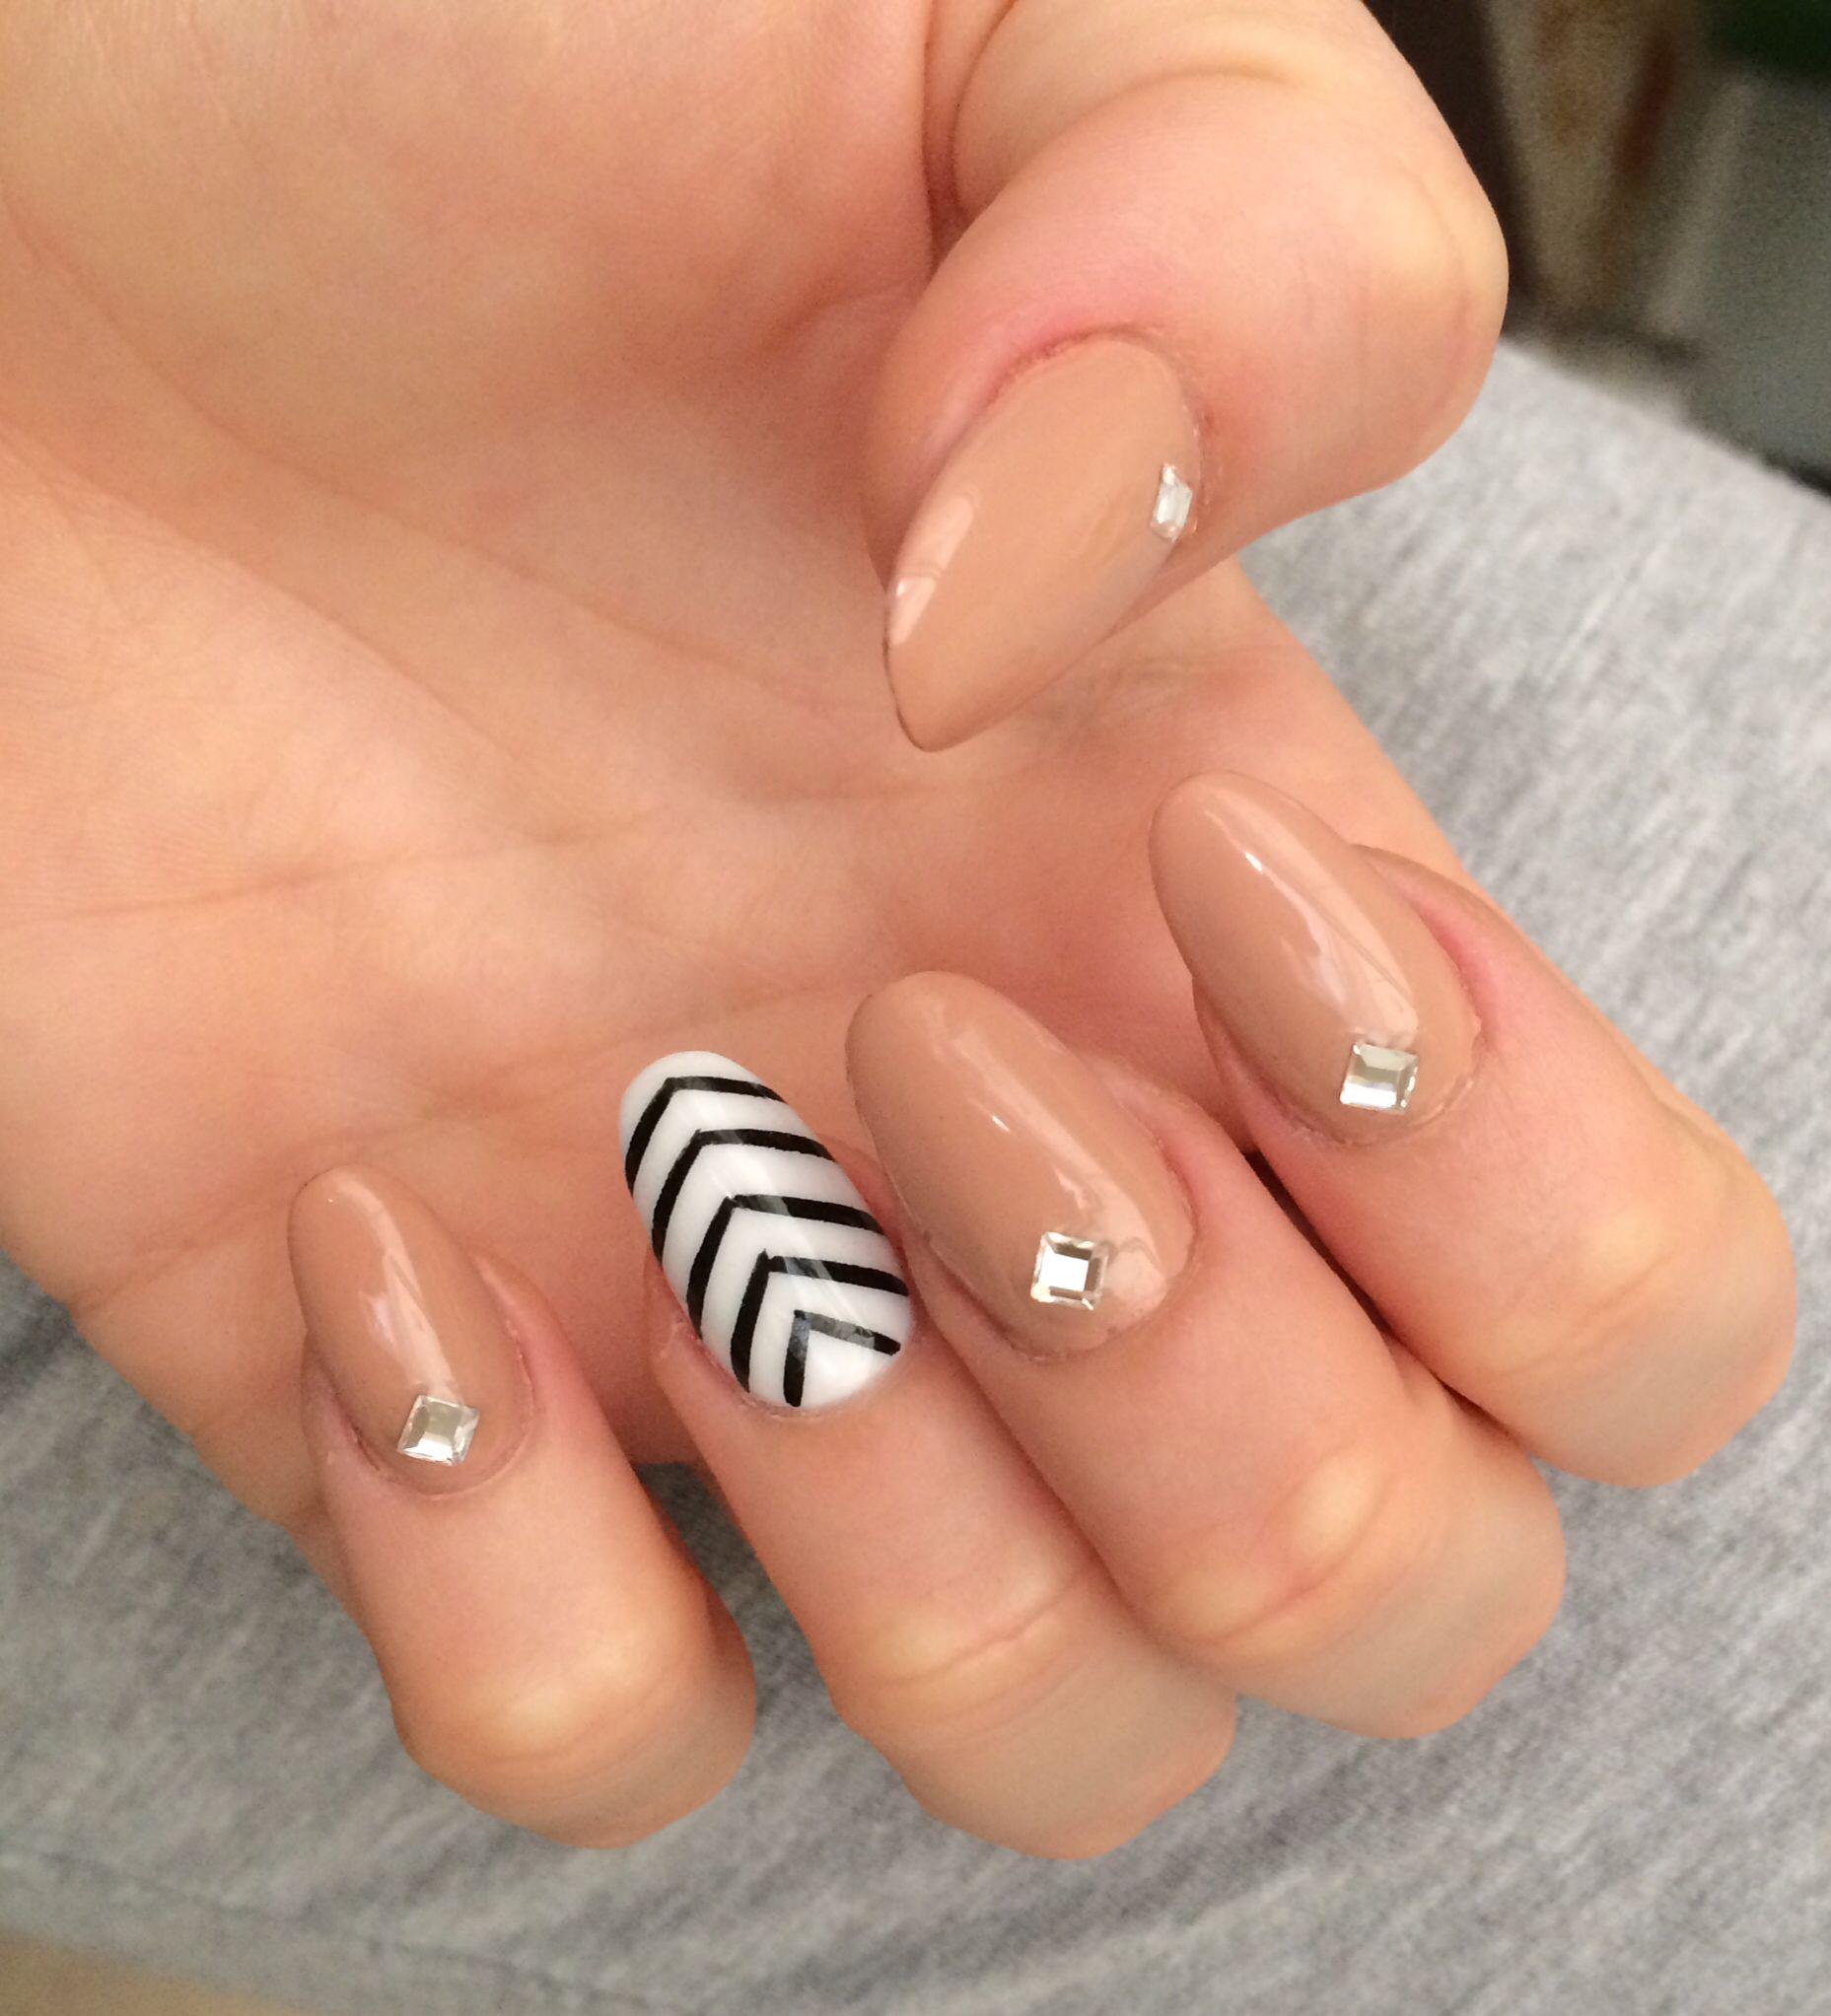 Oval Nails Acrylic Nail Design With Diamonds Beige Nails Nail Design Oval Acrylic Nails Cute Acrylic Nail Designs Oval Nails